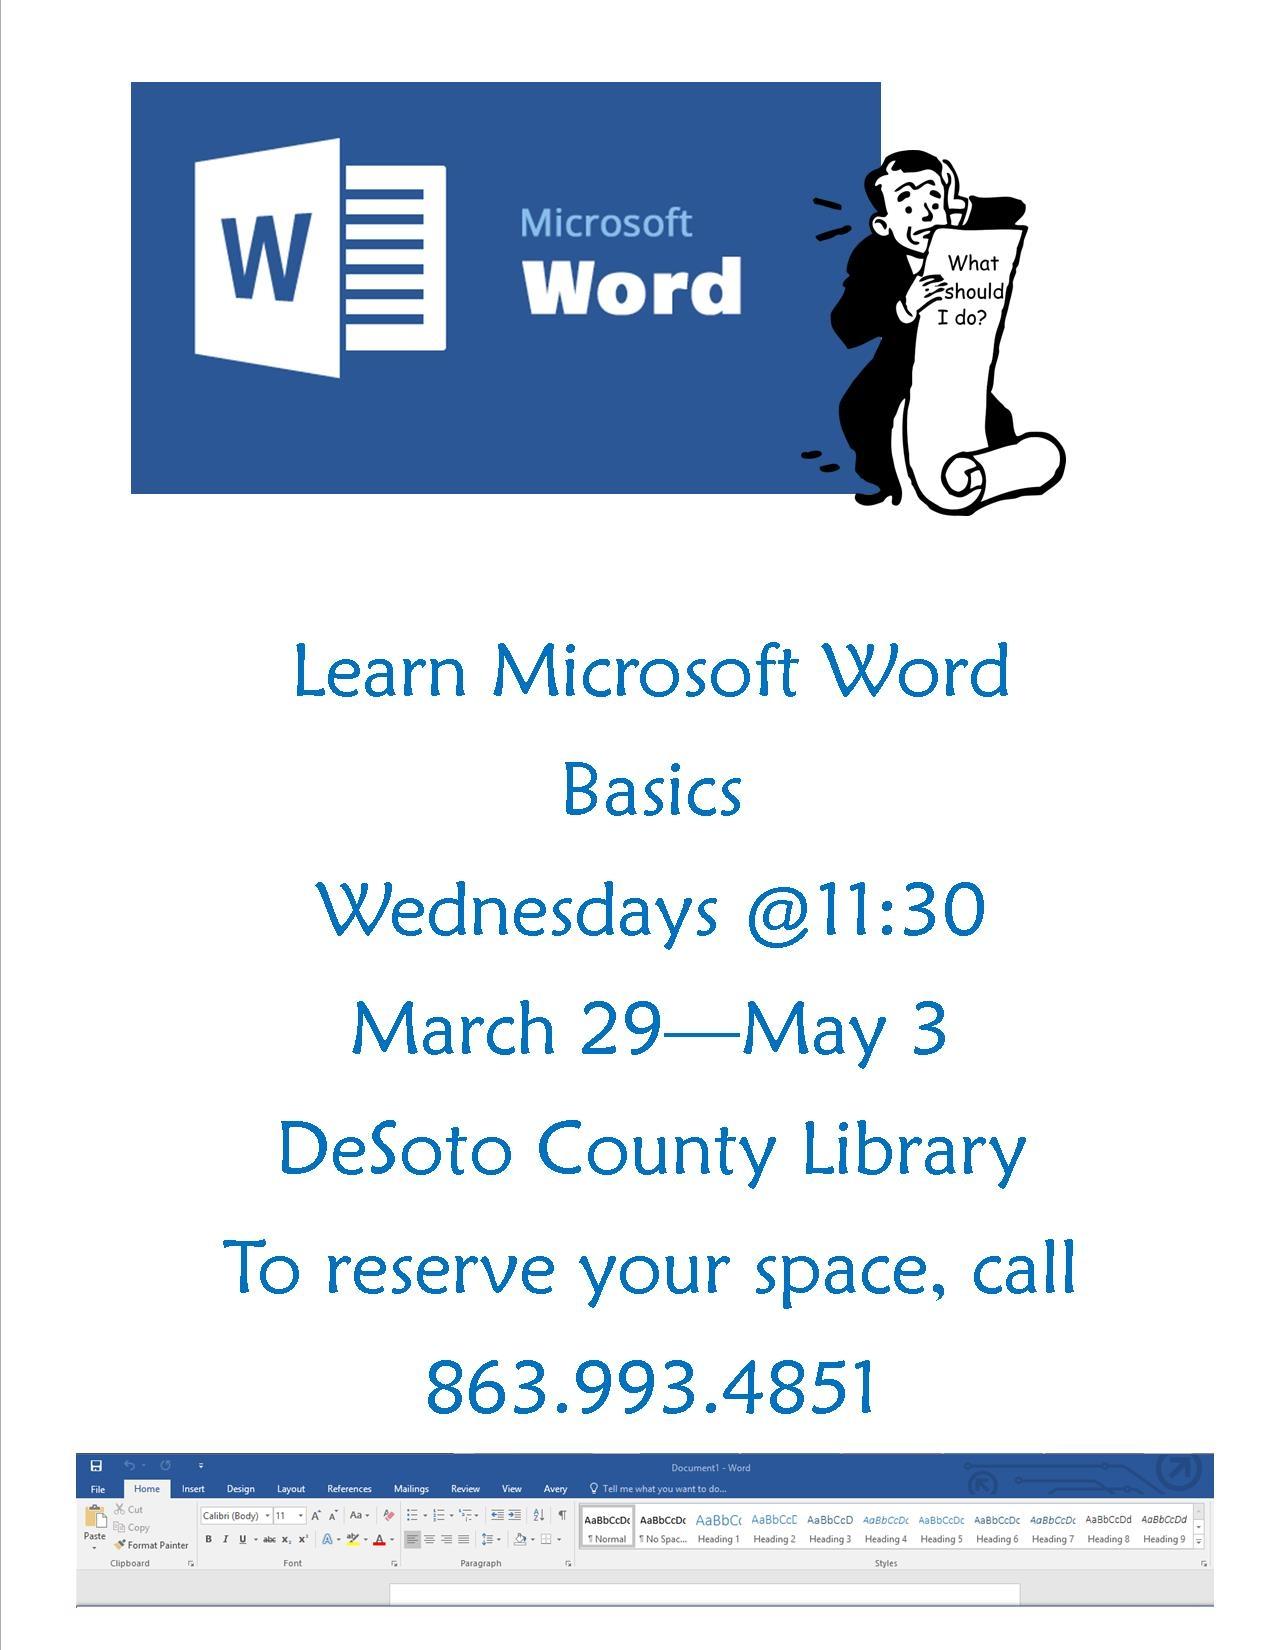 microsoft word flyer